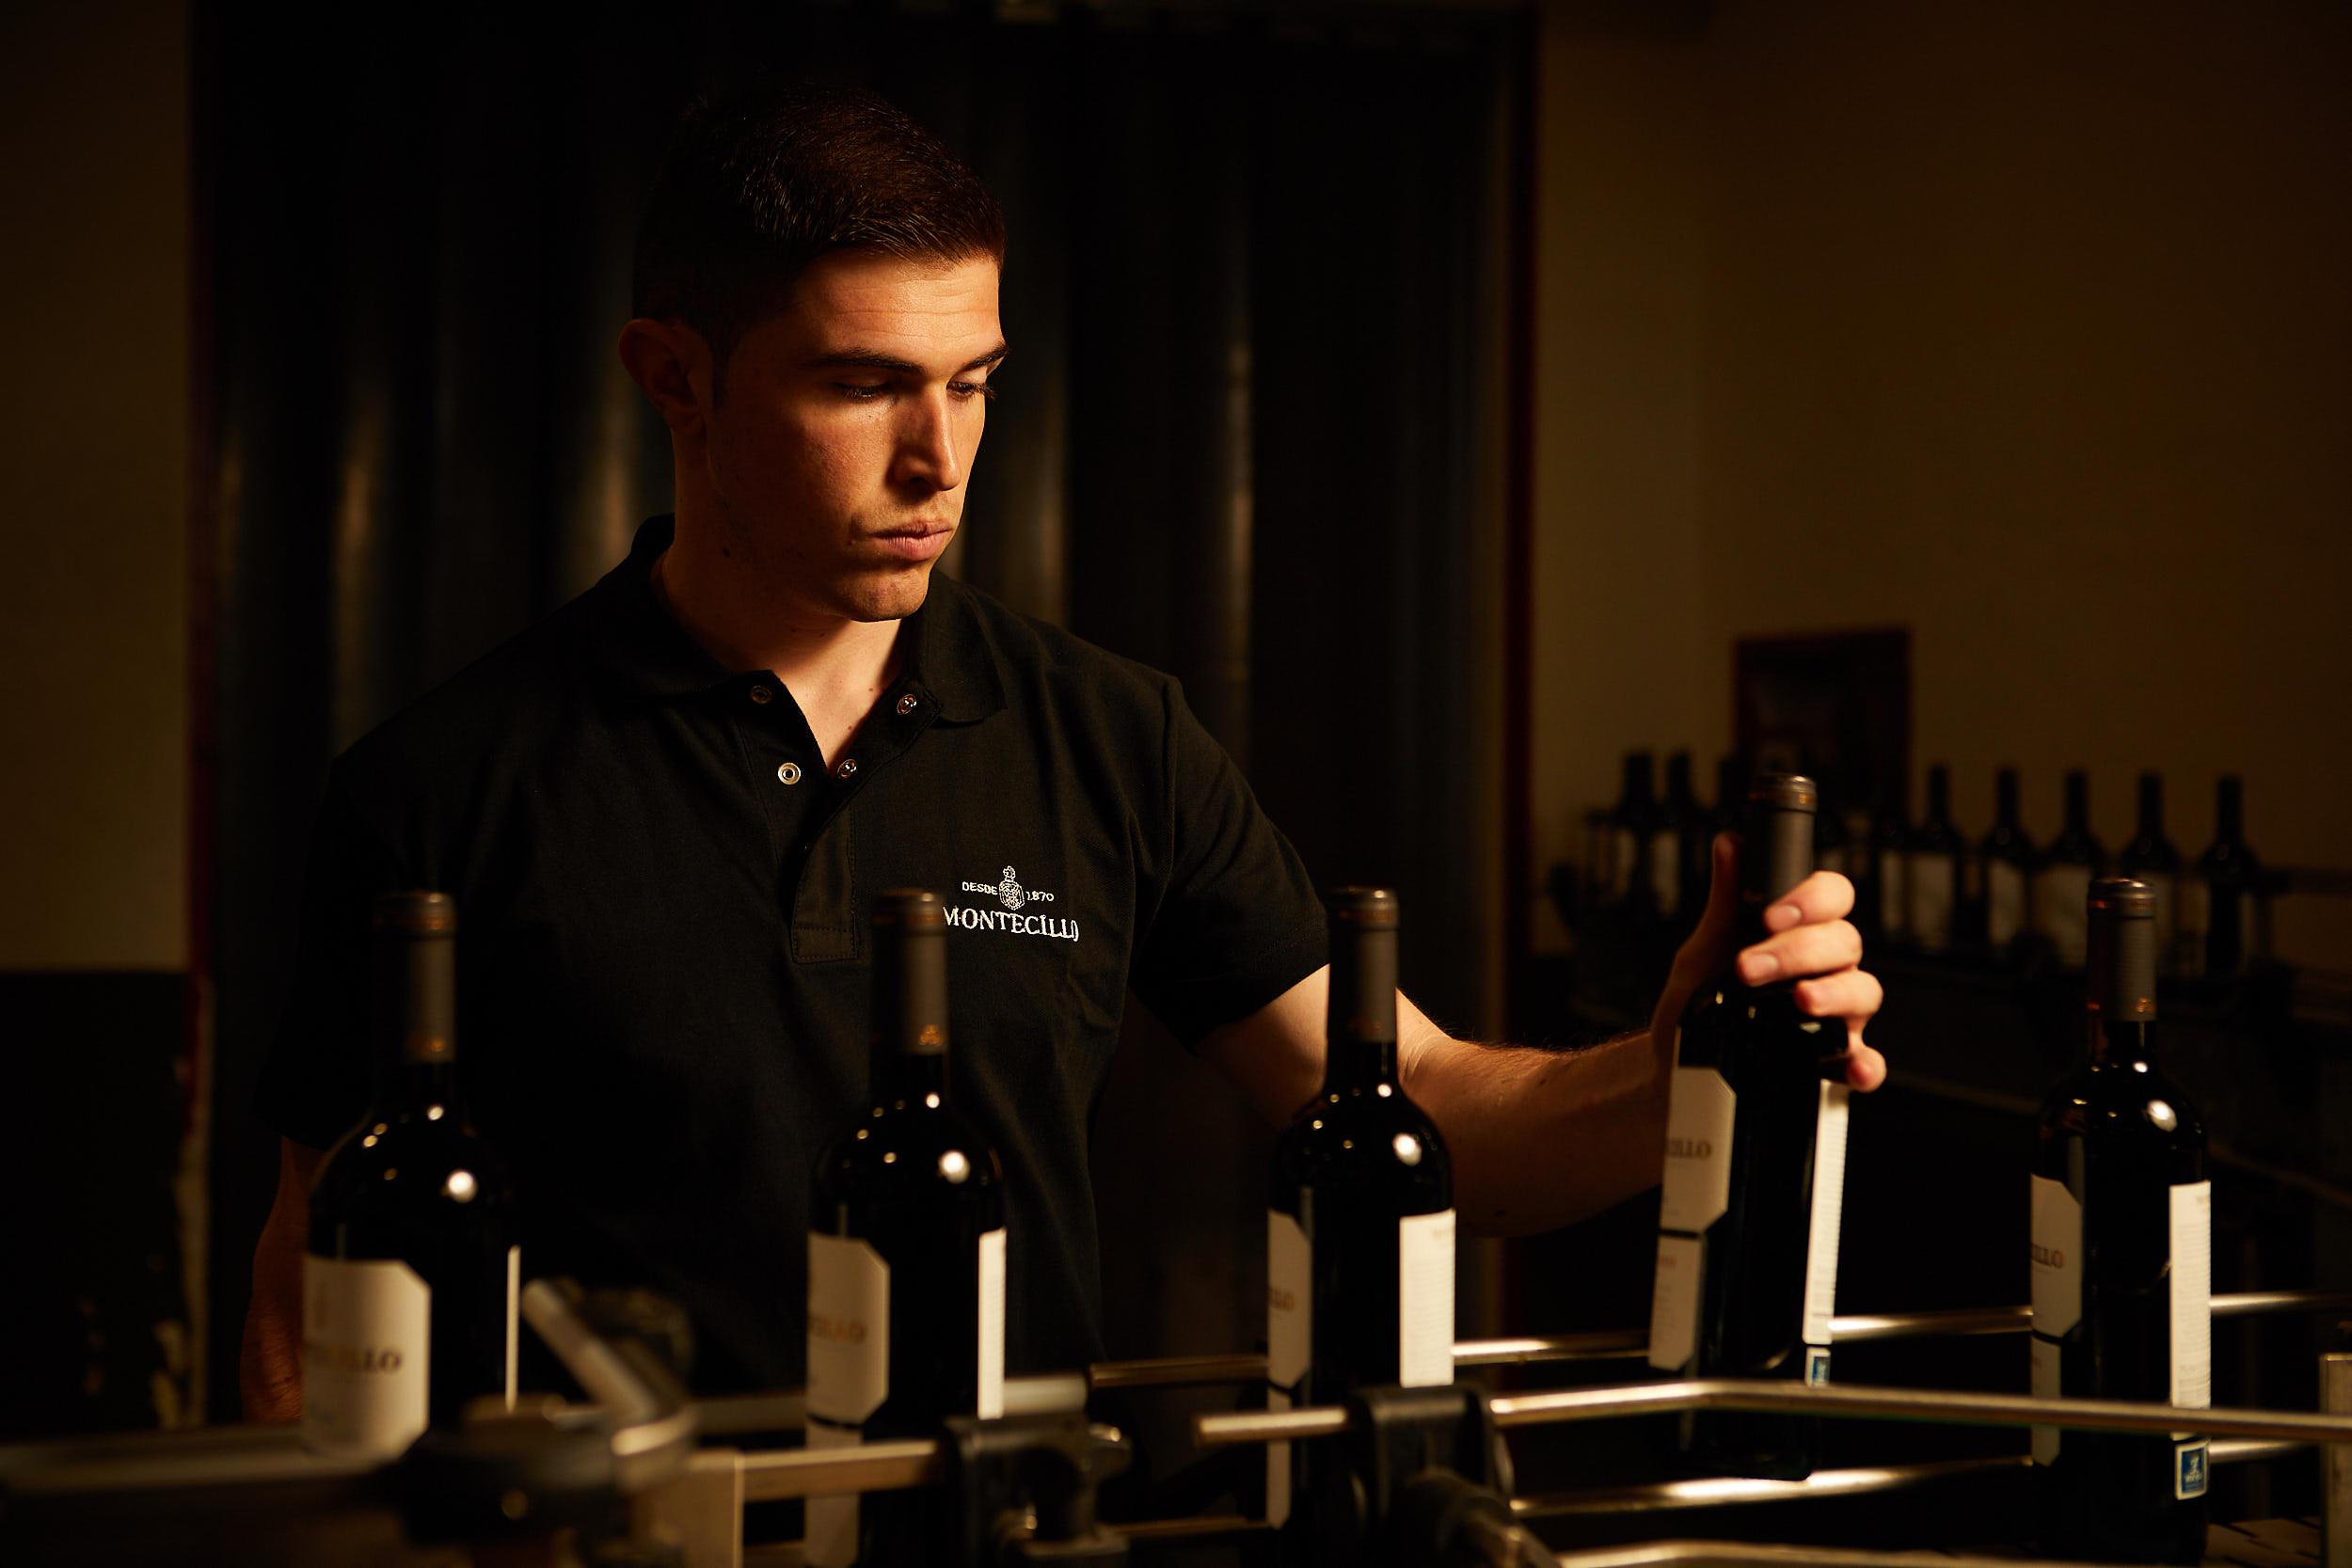 1805fotografia-profesional-corporativa-vino-rioja-espana-James-Sturcke_0020.jpg